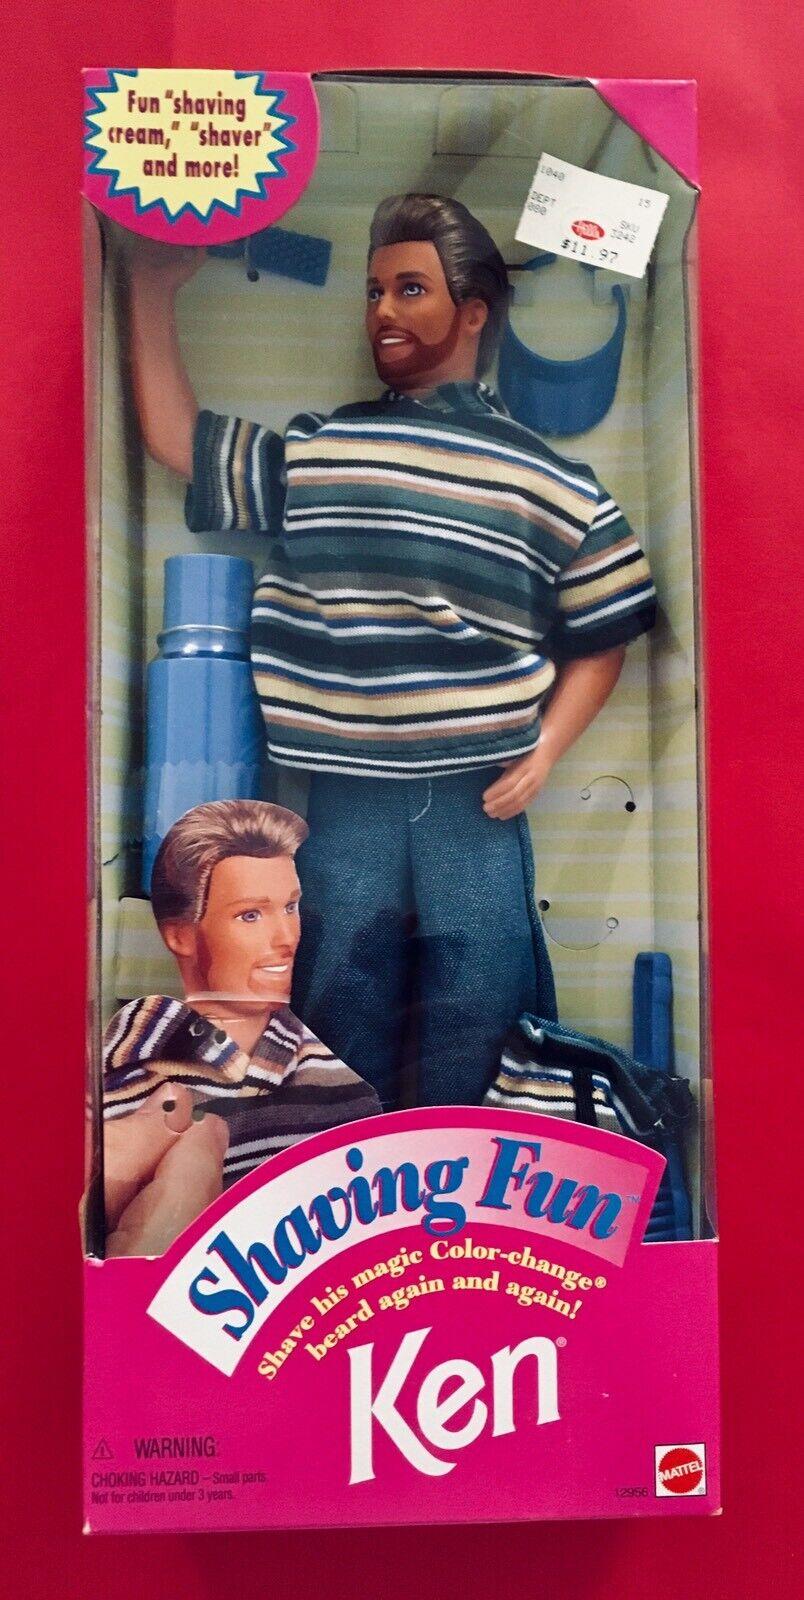 BARBIE's BF KEN SHAVING FUN NRFB 1994